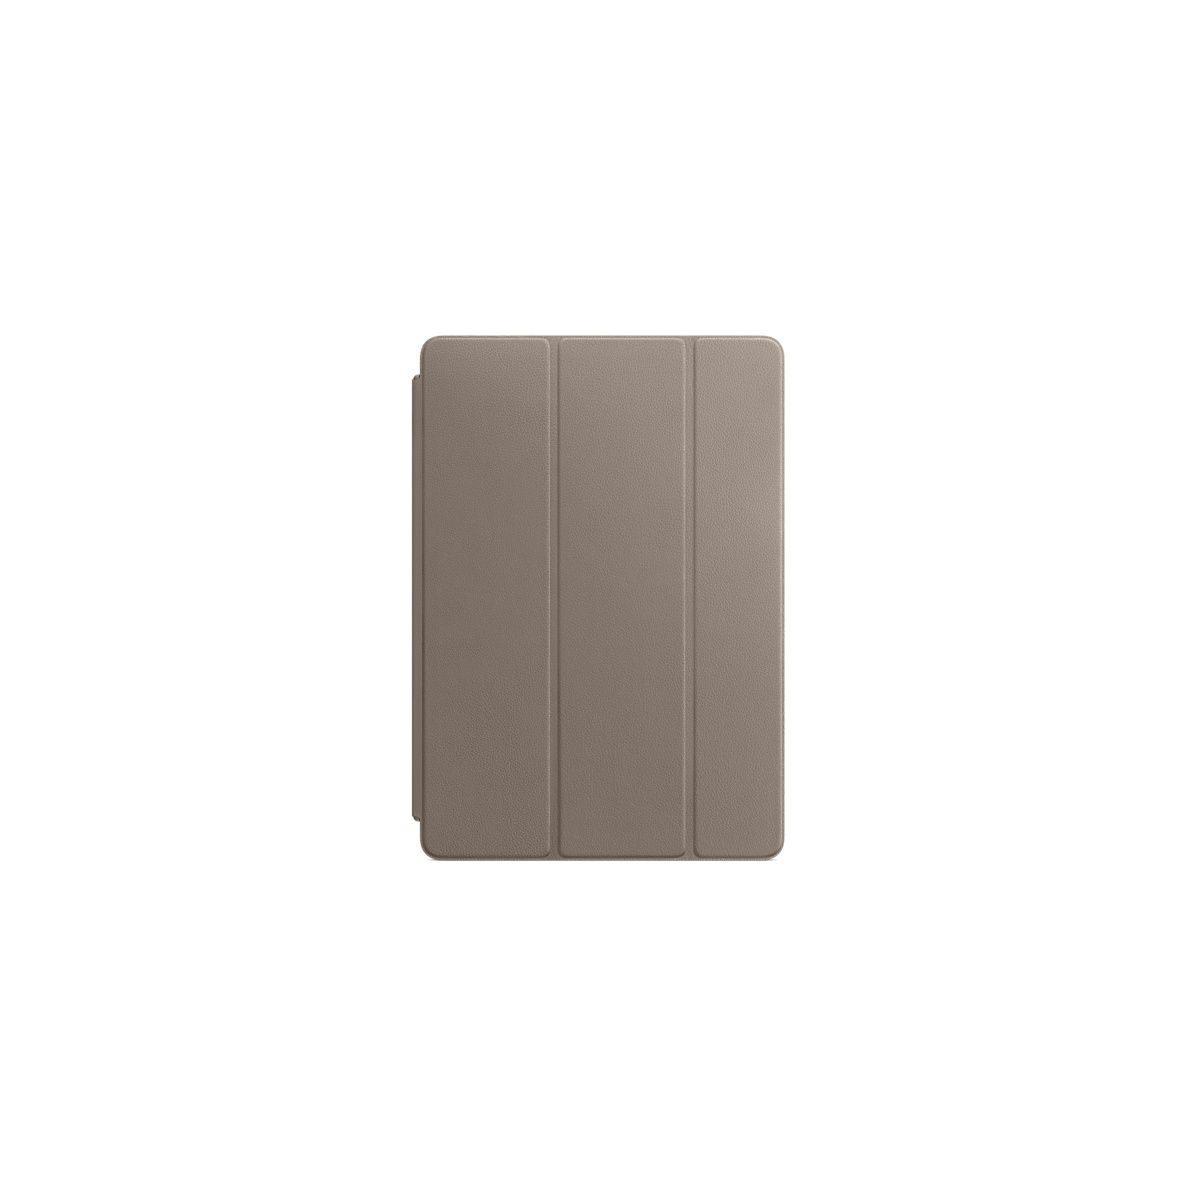 Etui tablette apple smart cover ipad pro 10.5 cuir taupe - livraison offerte : code livprem (photo)